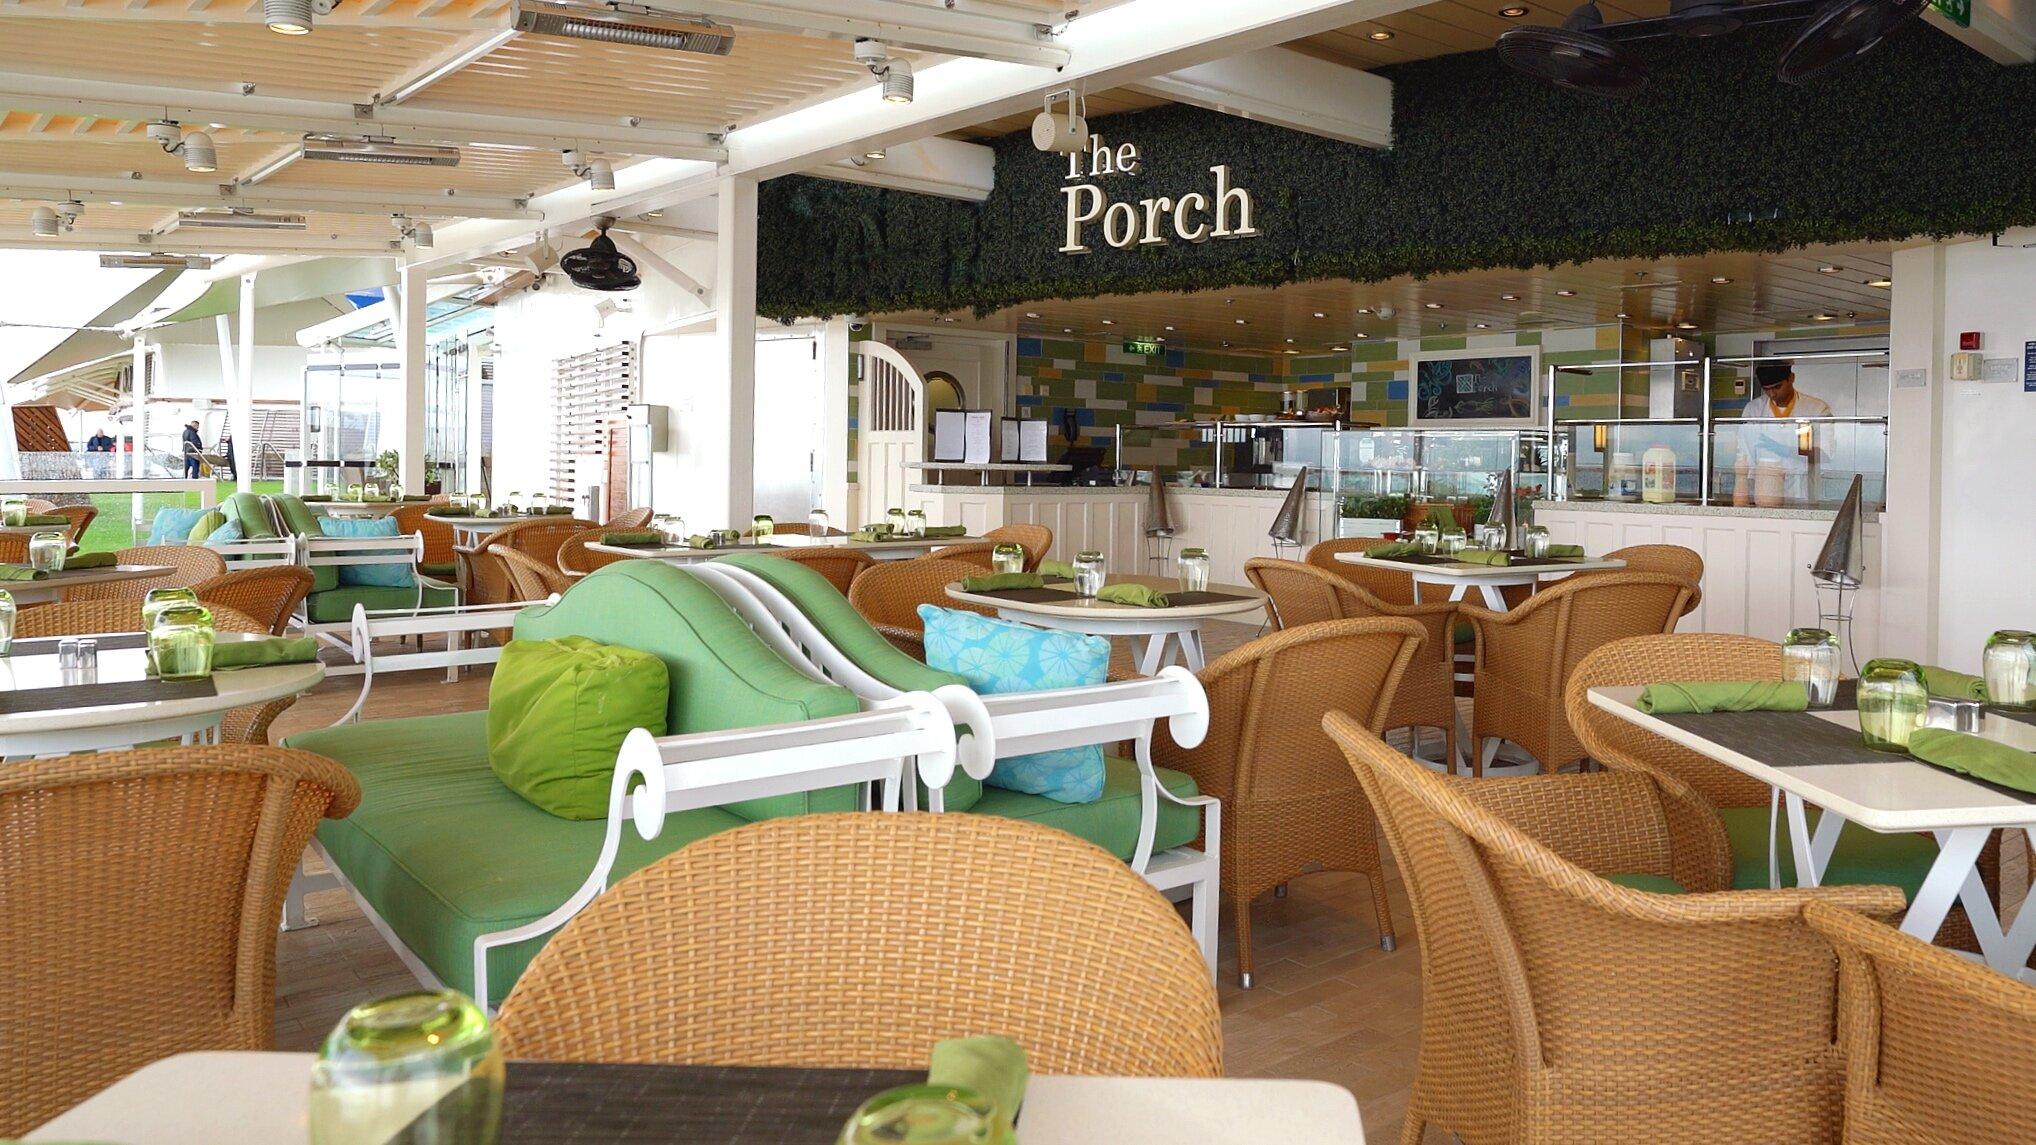 The Porch al fresco seafood restaurant.